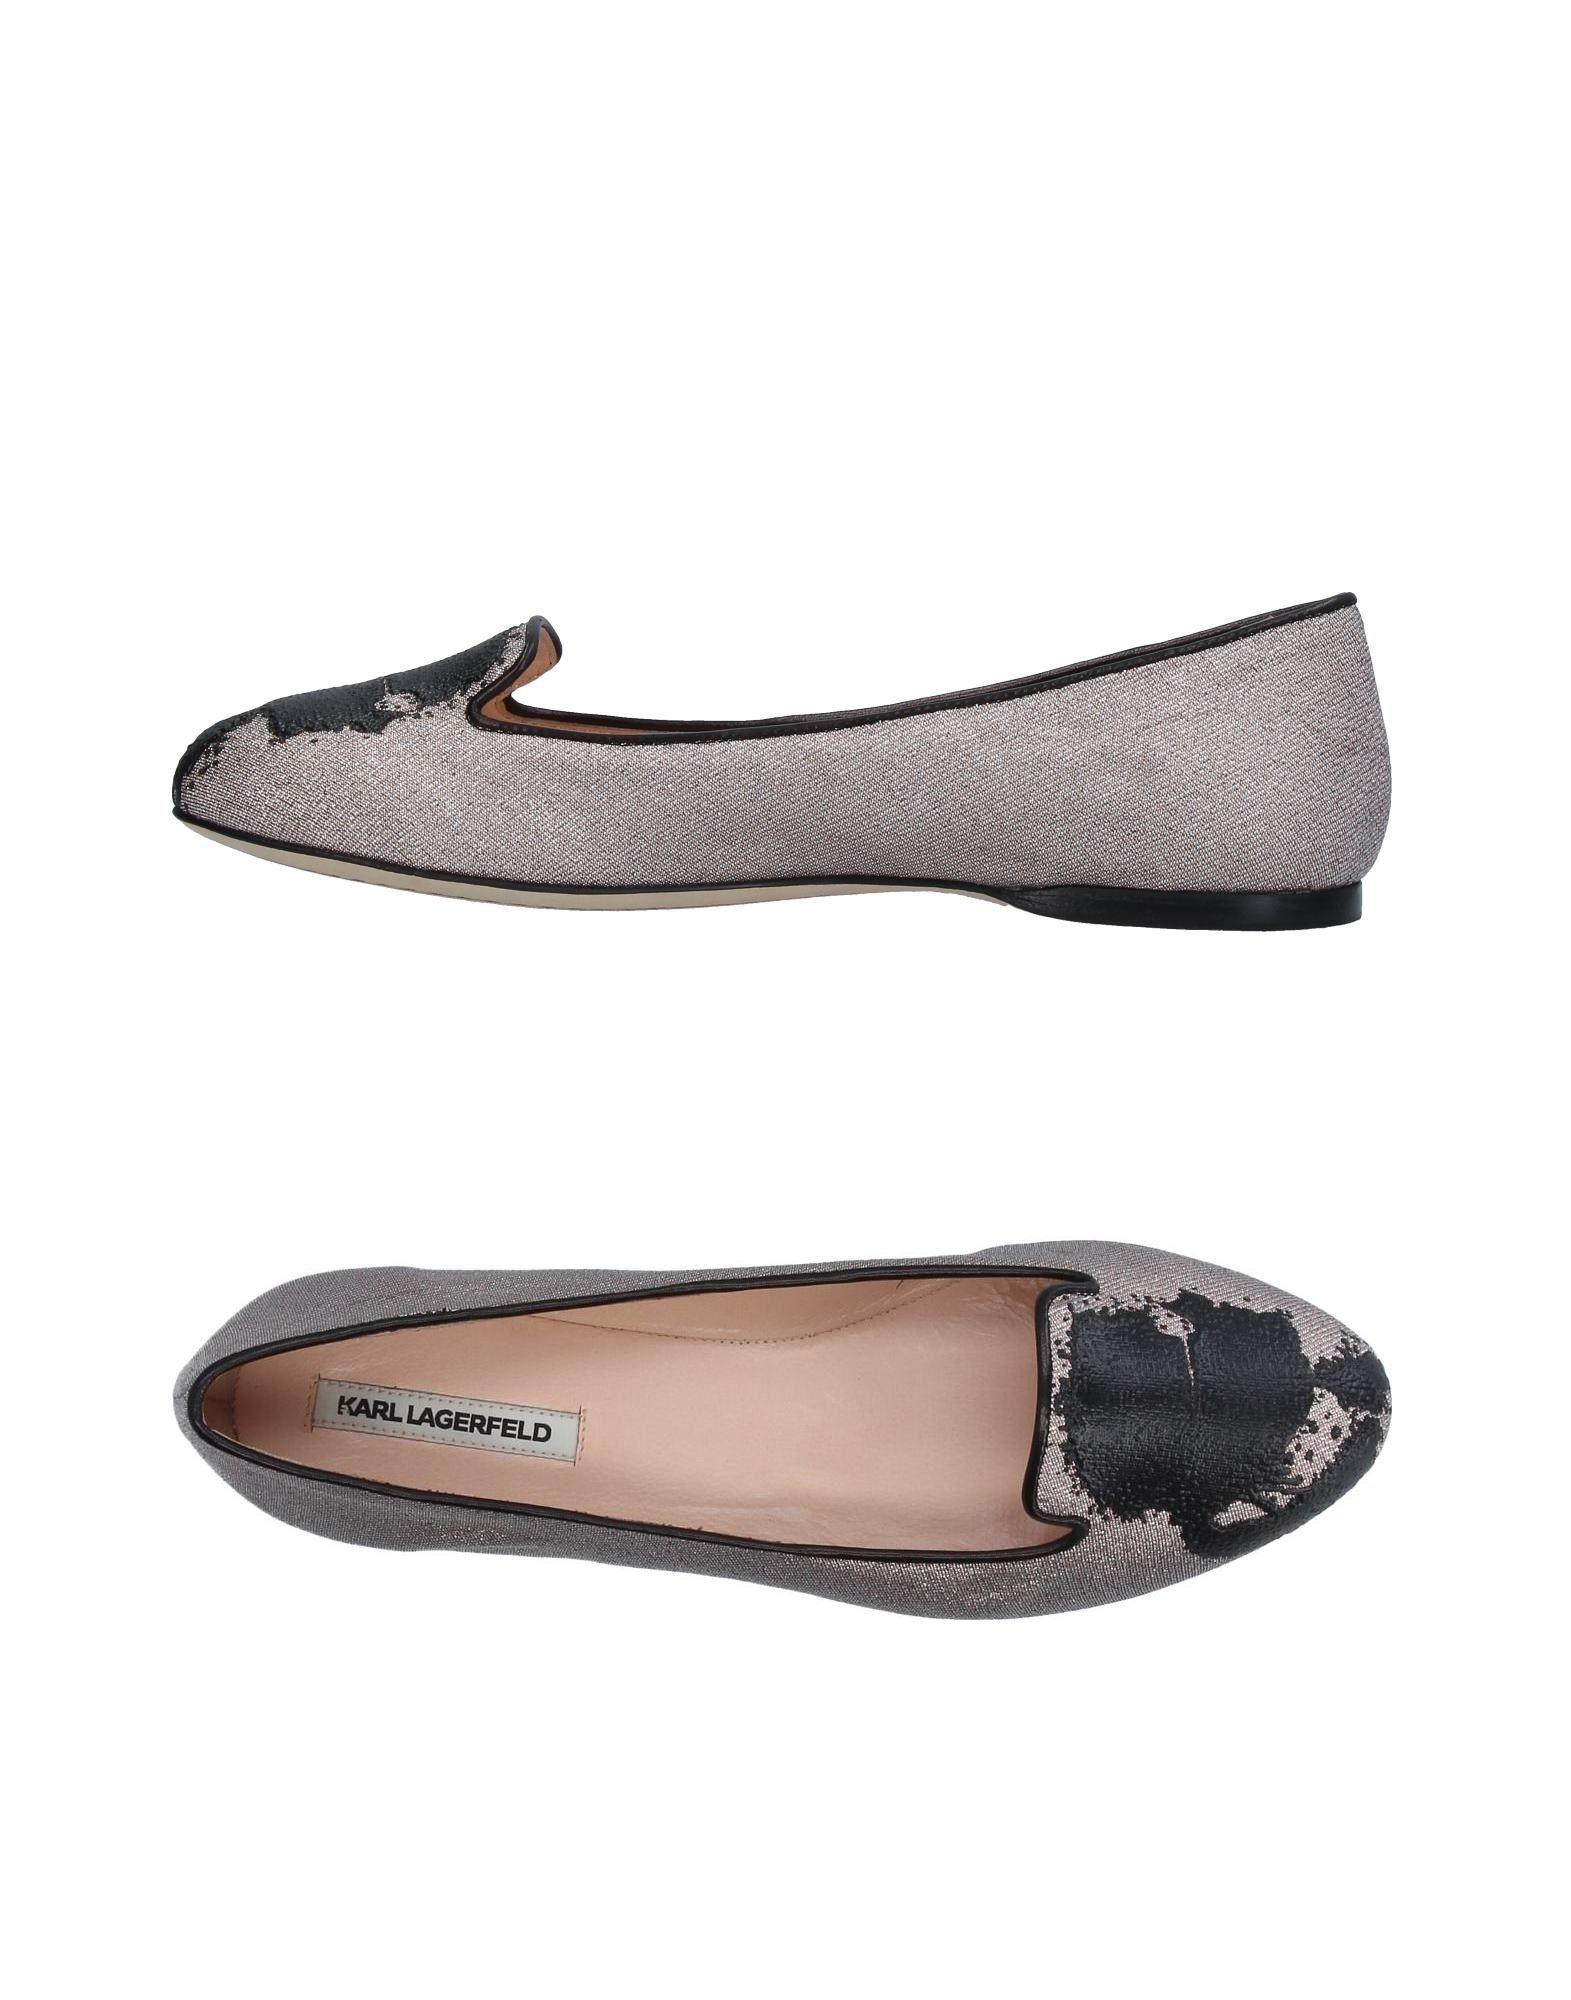 Karl Lagerfeld Mokassins Damen  11373703JO Gute Qualität beliebte Schuhe